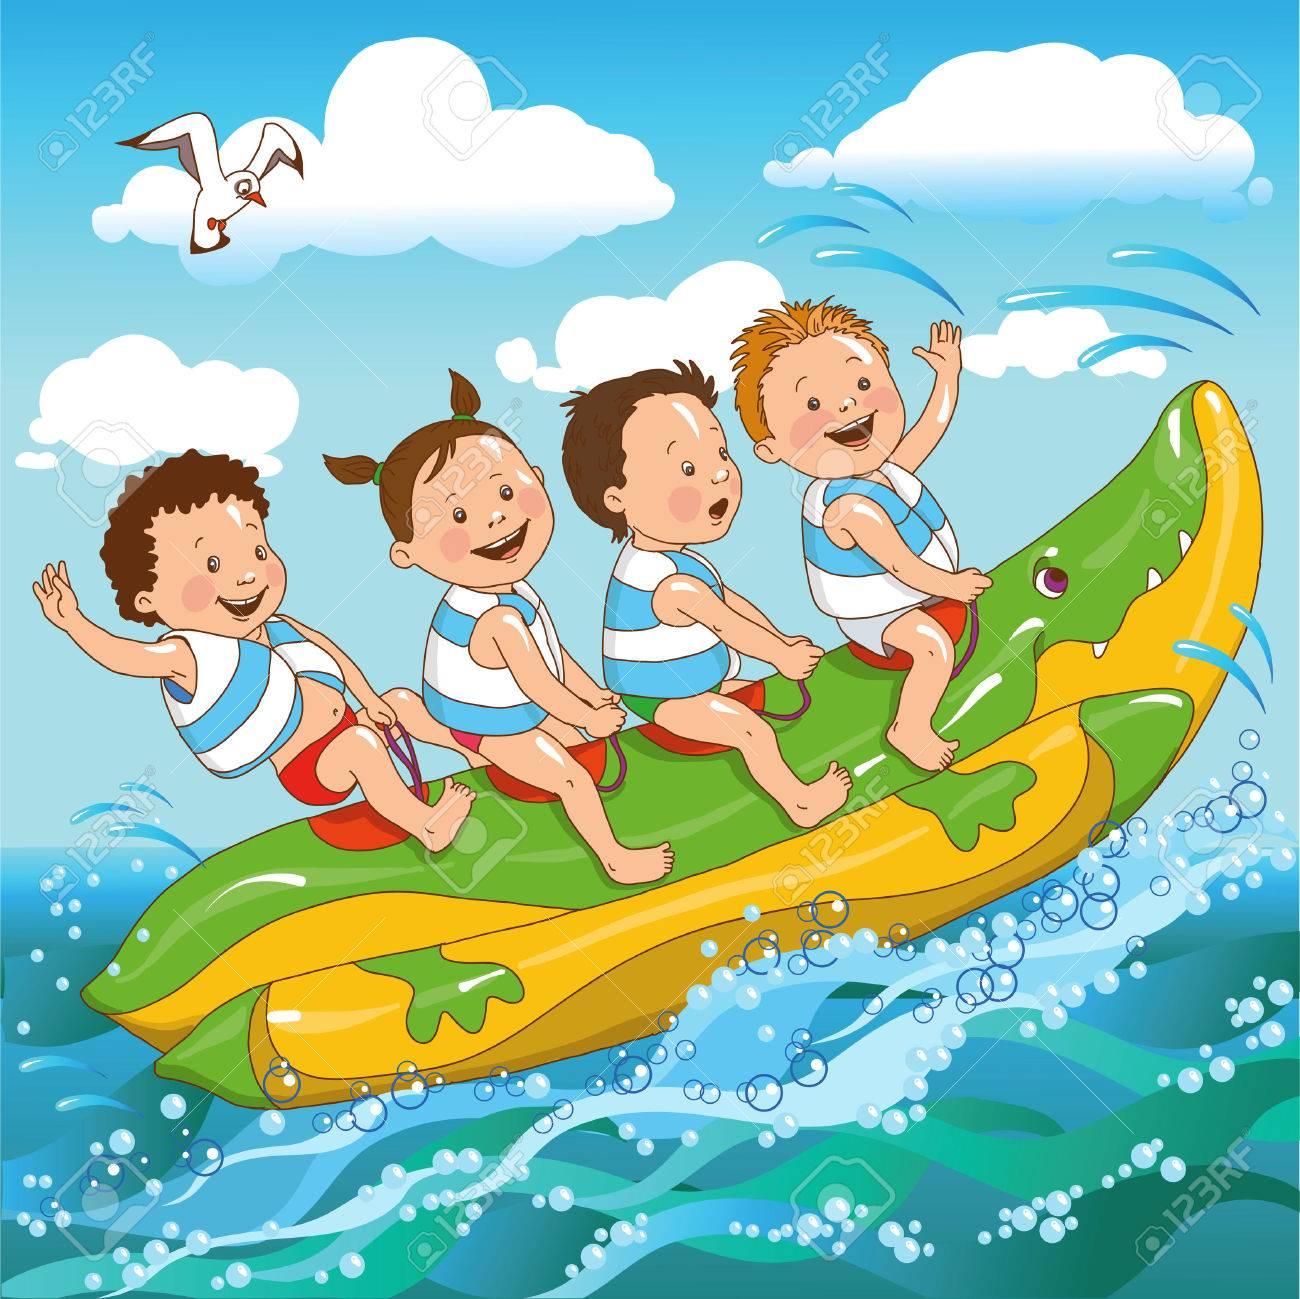 joyful kids ride on a banana boat sea - 46515262